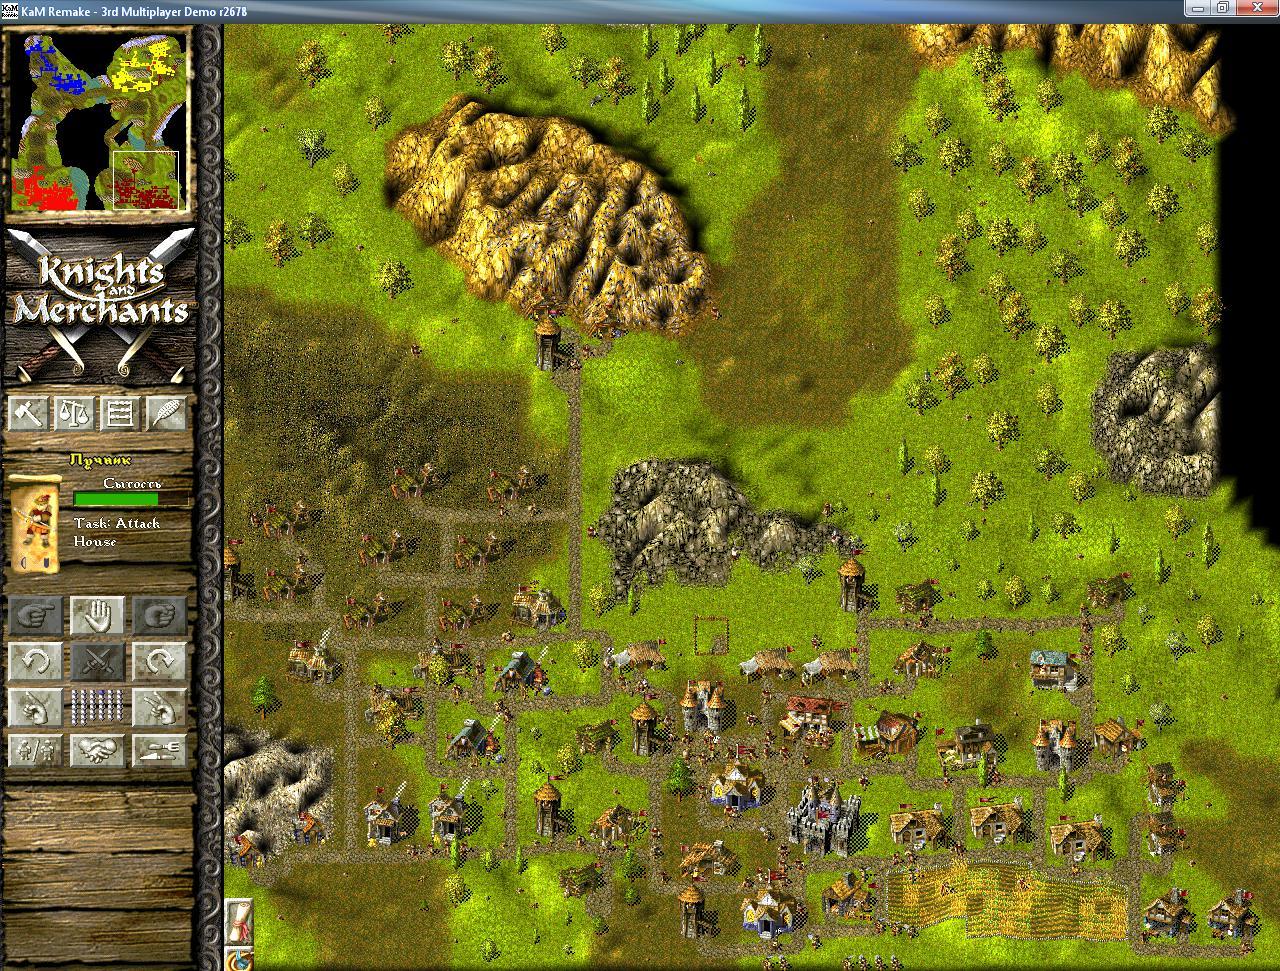 8.JPG - Knights & Merchants: The Peasants Rebellion